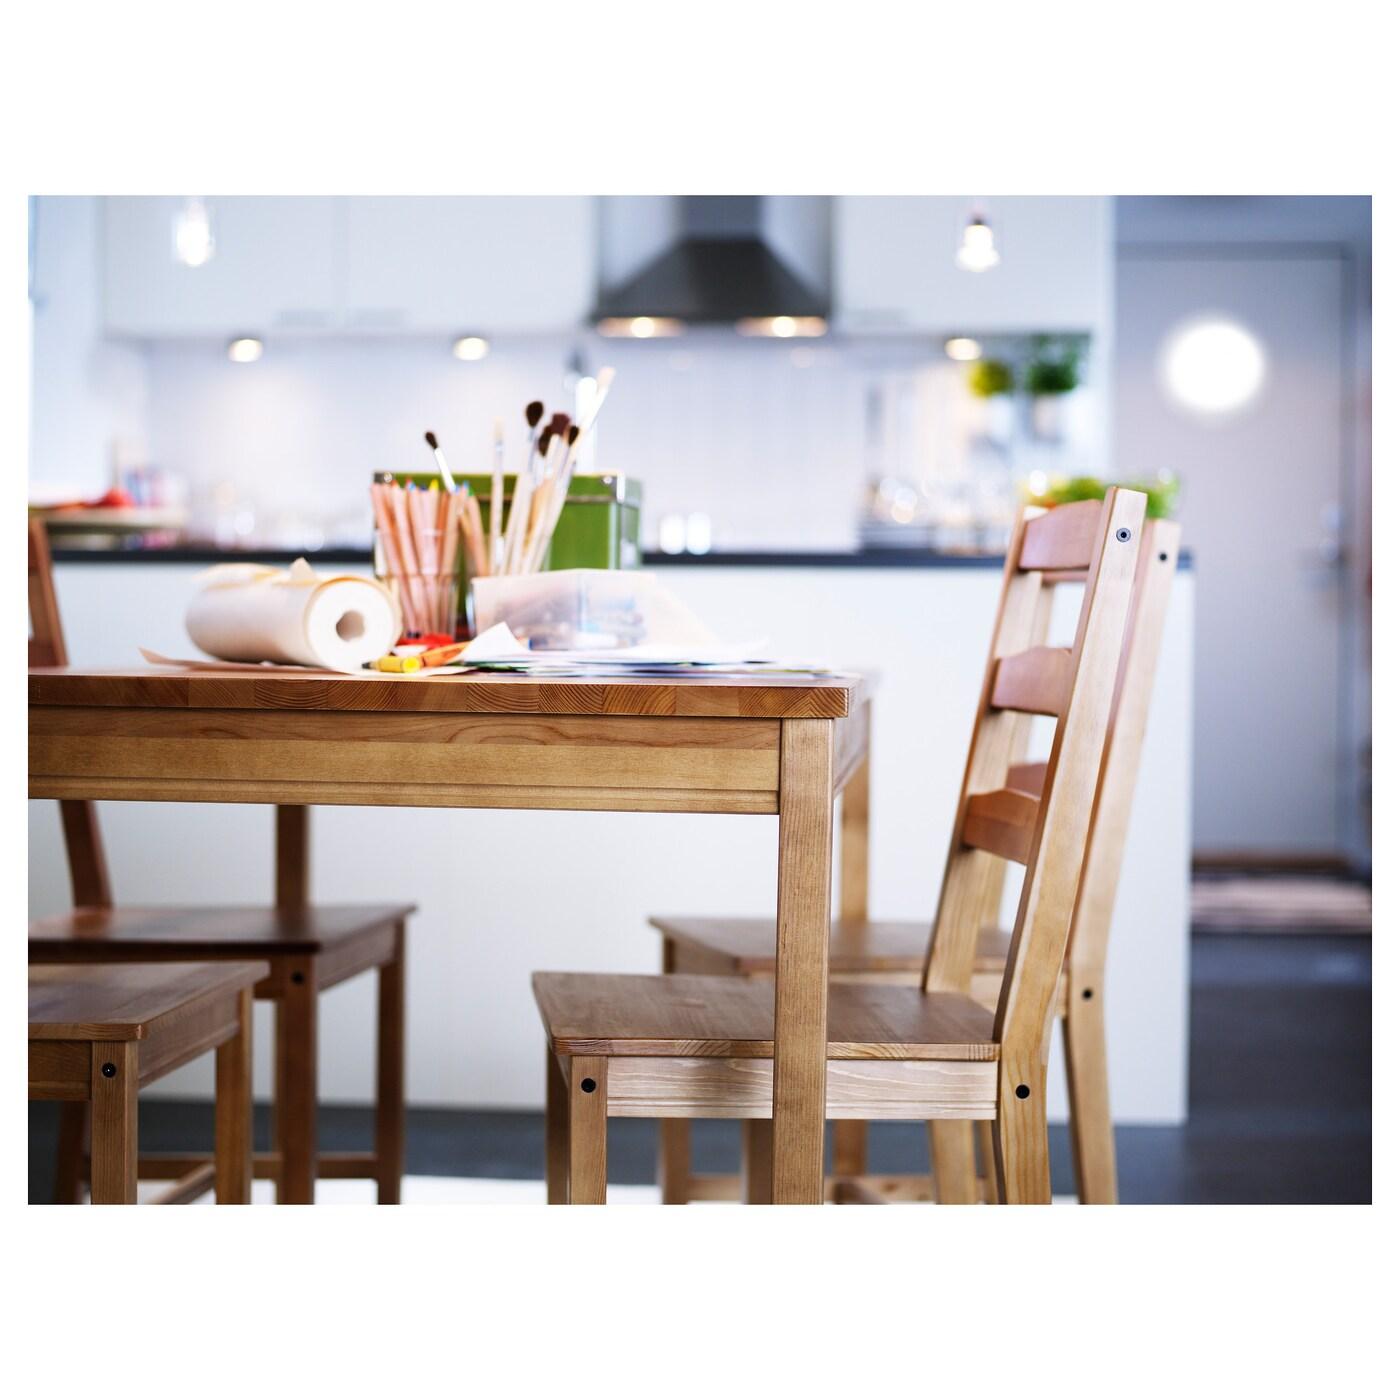 JOKKMOKK Table and 4 chairs Antique stain IKEA : jokkmokk table and 4 chairs antique stain0208609pe197452s5 from www.ikea.com size 2000 x 2000 jpeg 465kB